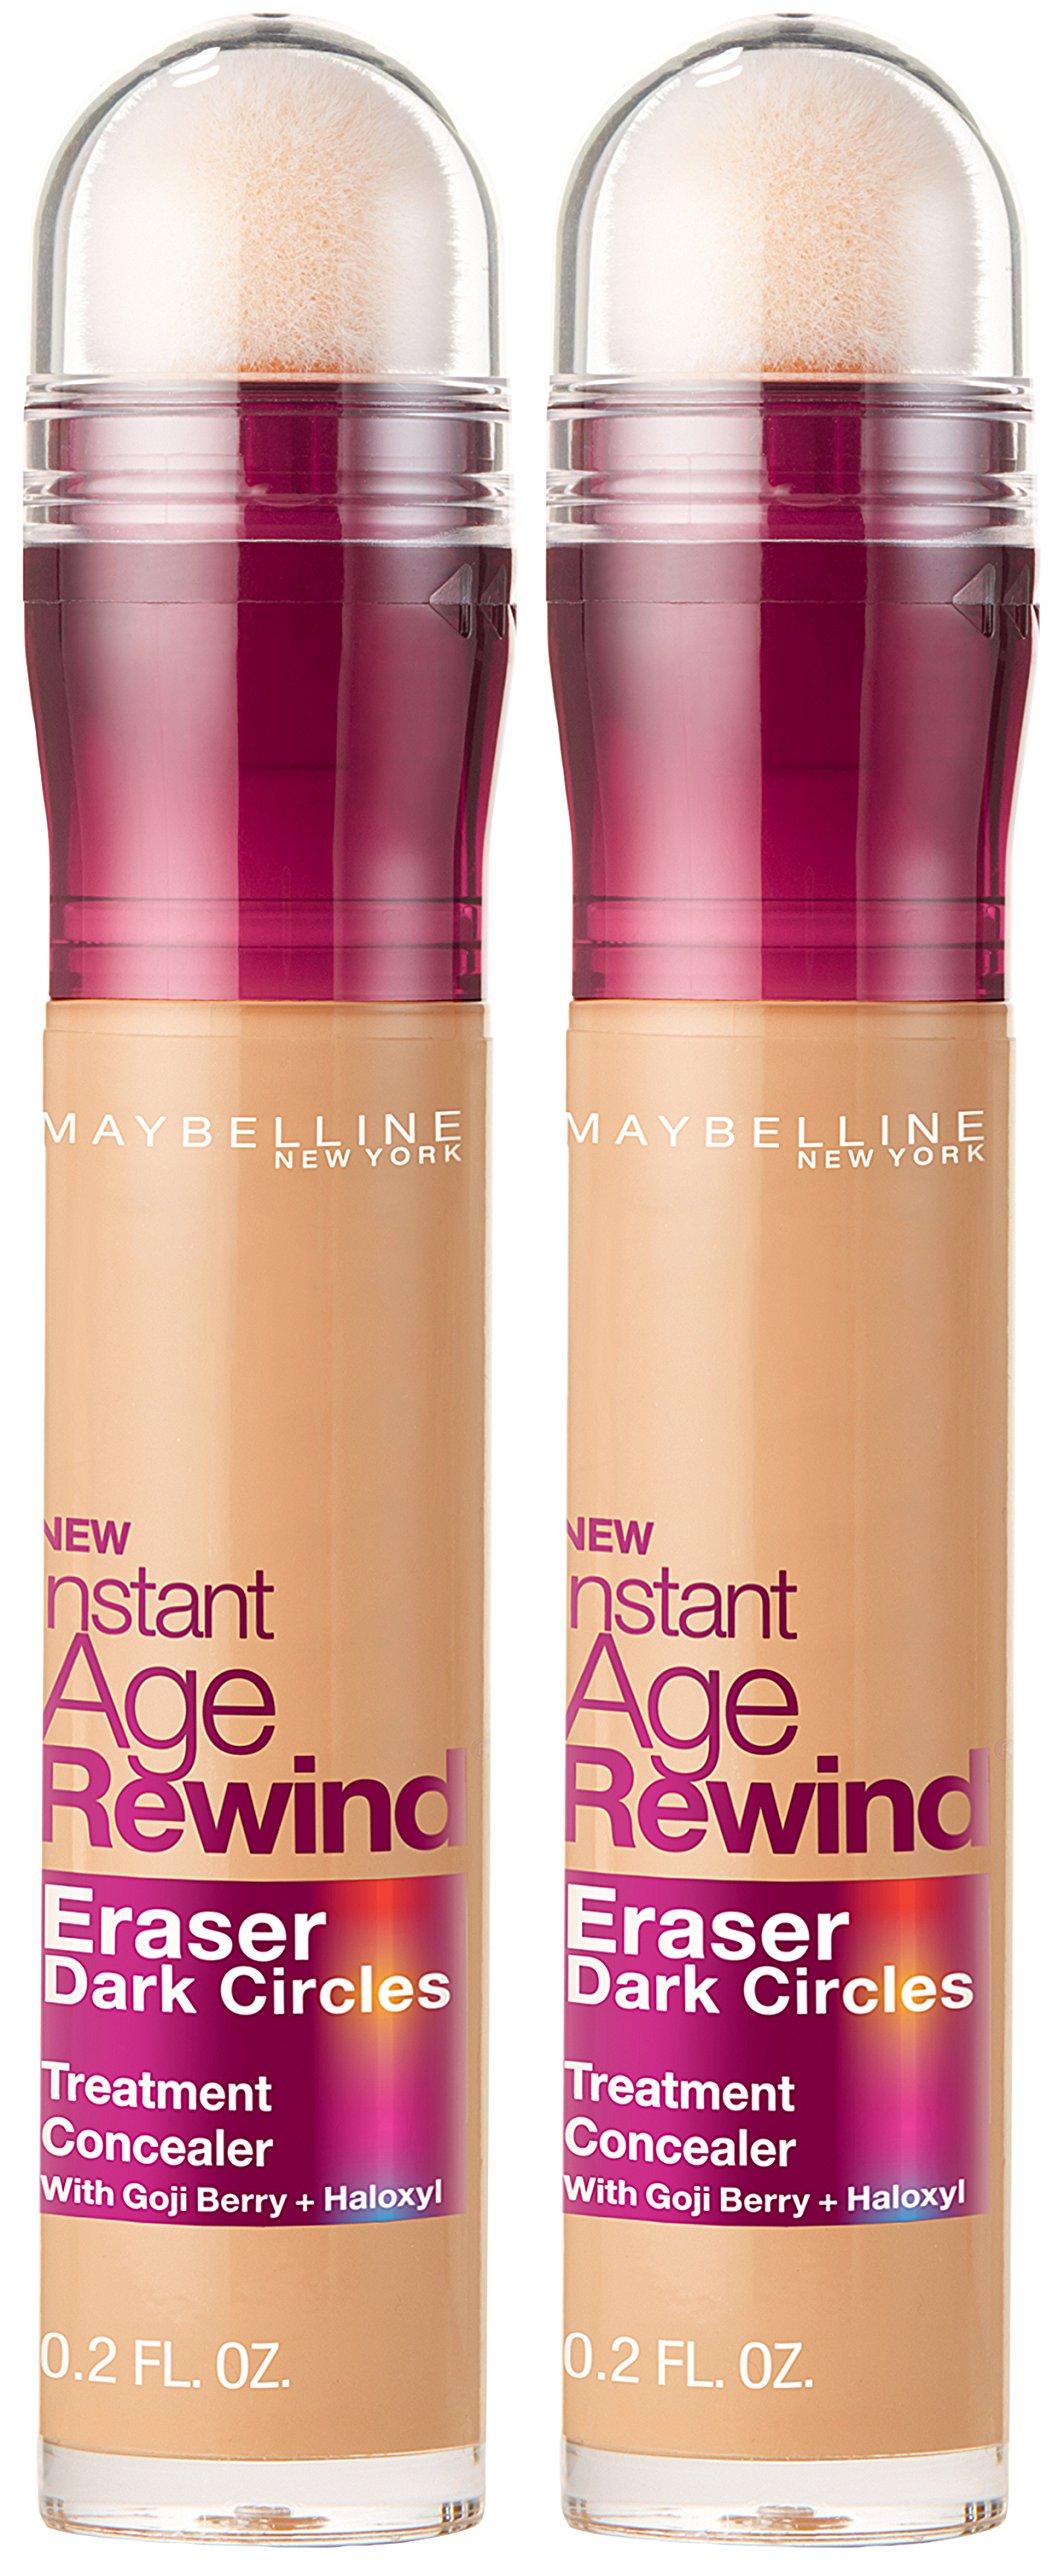 Maybelline New York Instant Age Rewind Eraser Dark Circles Treatment Concealer Makeup, Medium, 2 count